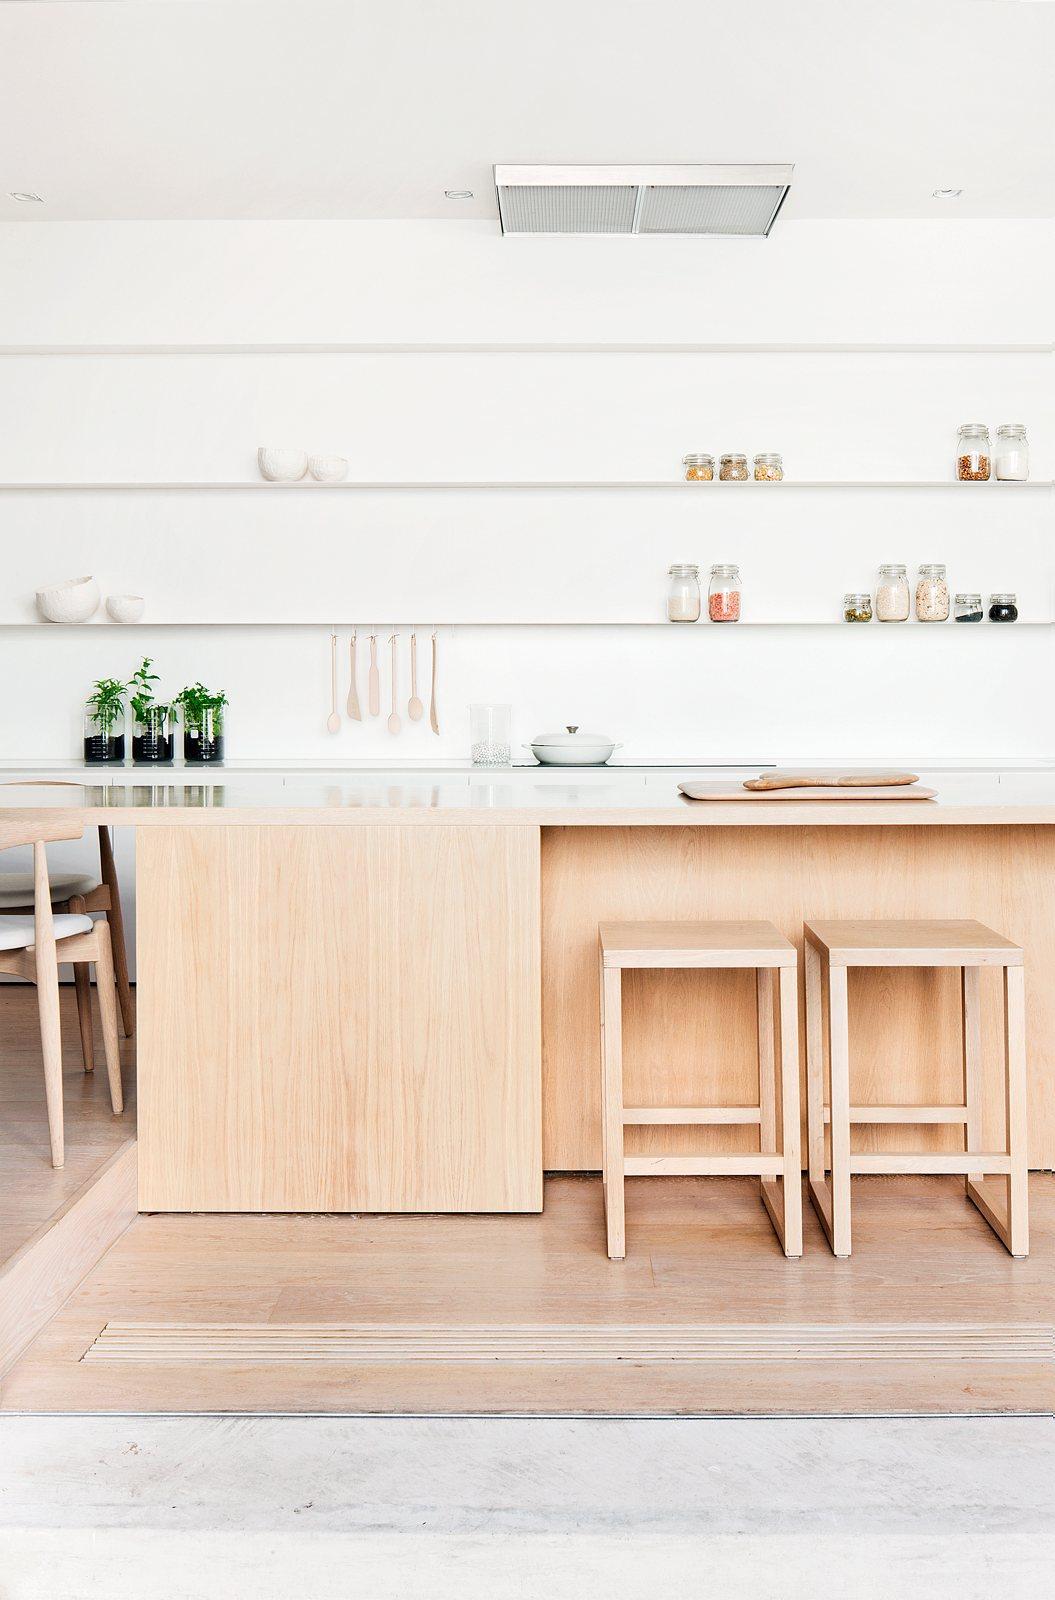 atelier rue verte le blog sydney prix australien du. Black Bedroom Furniture Sets. Home Design Ideas